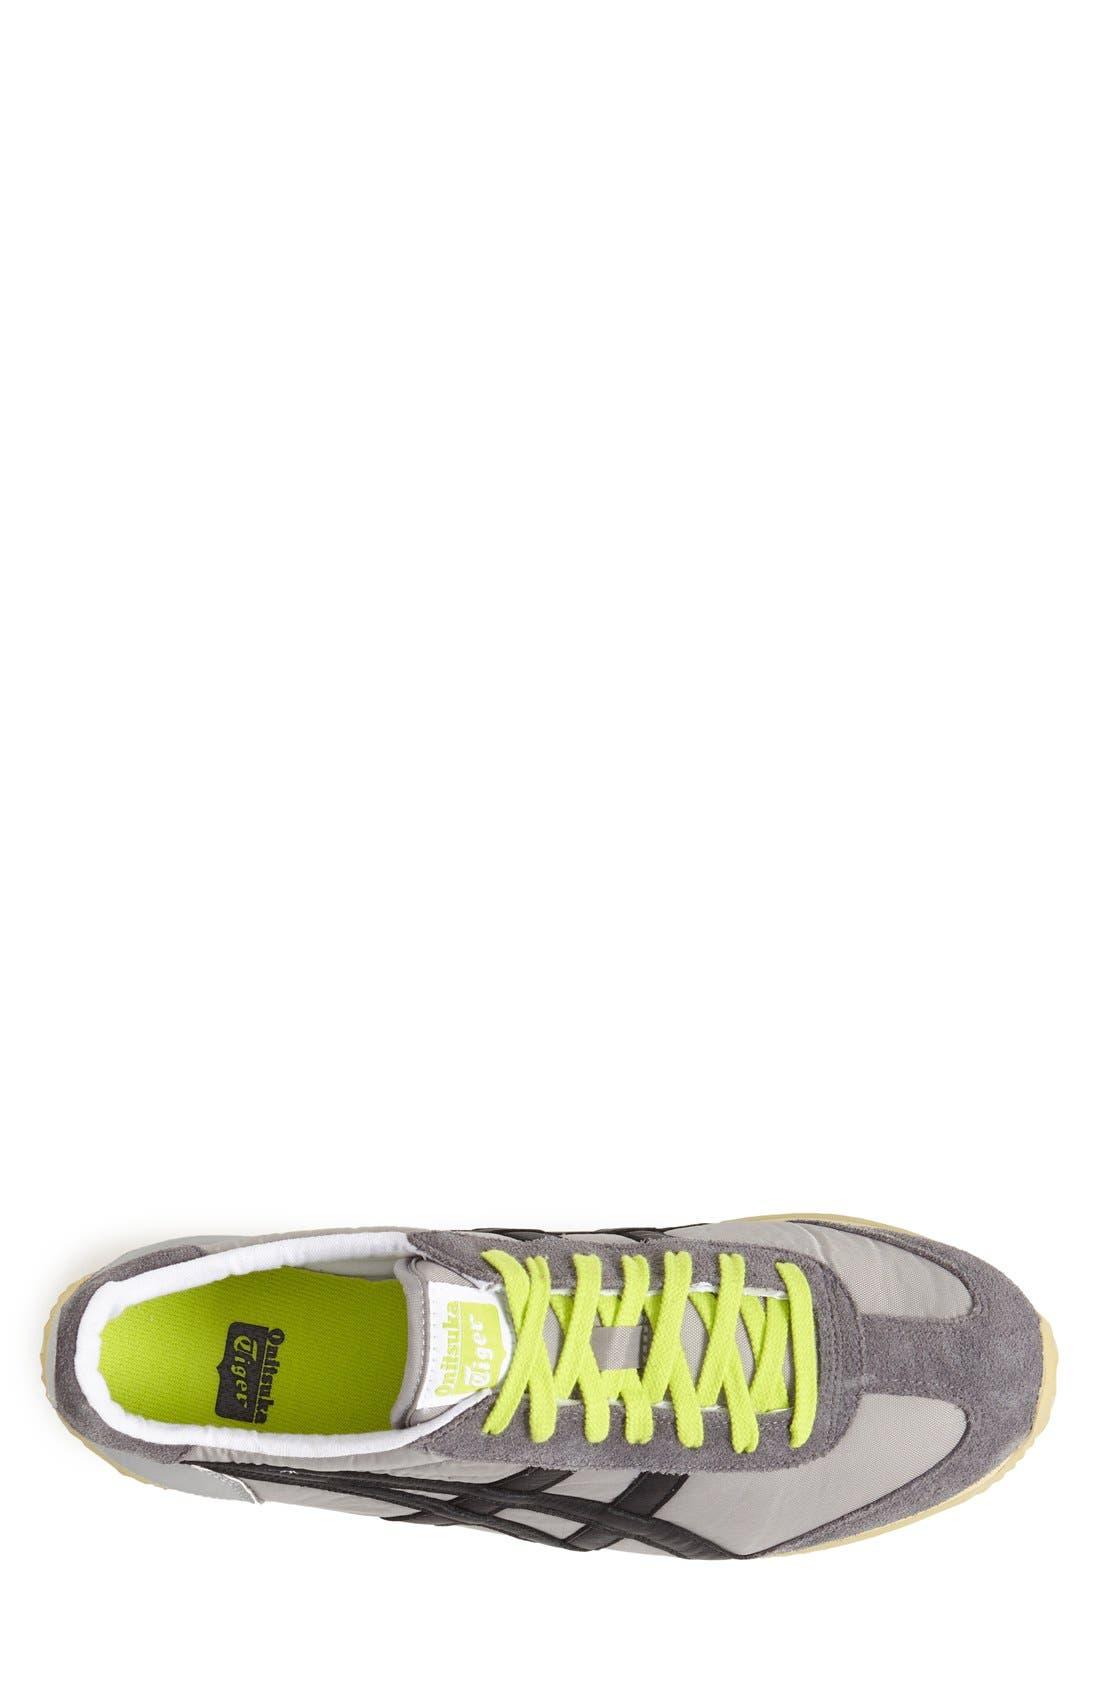 Alternate Image 2  - Onitsuka Tiger™ 'California '78™ Vintage' Athletic Shoe